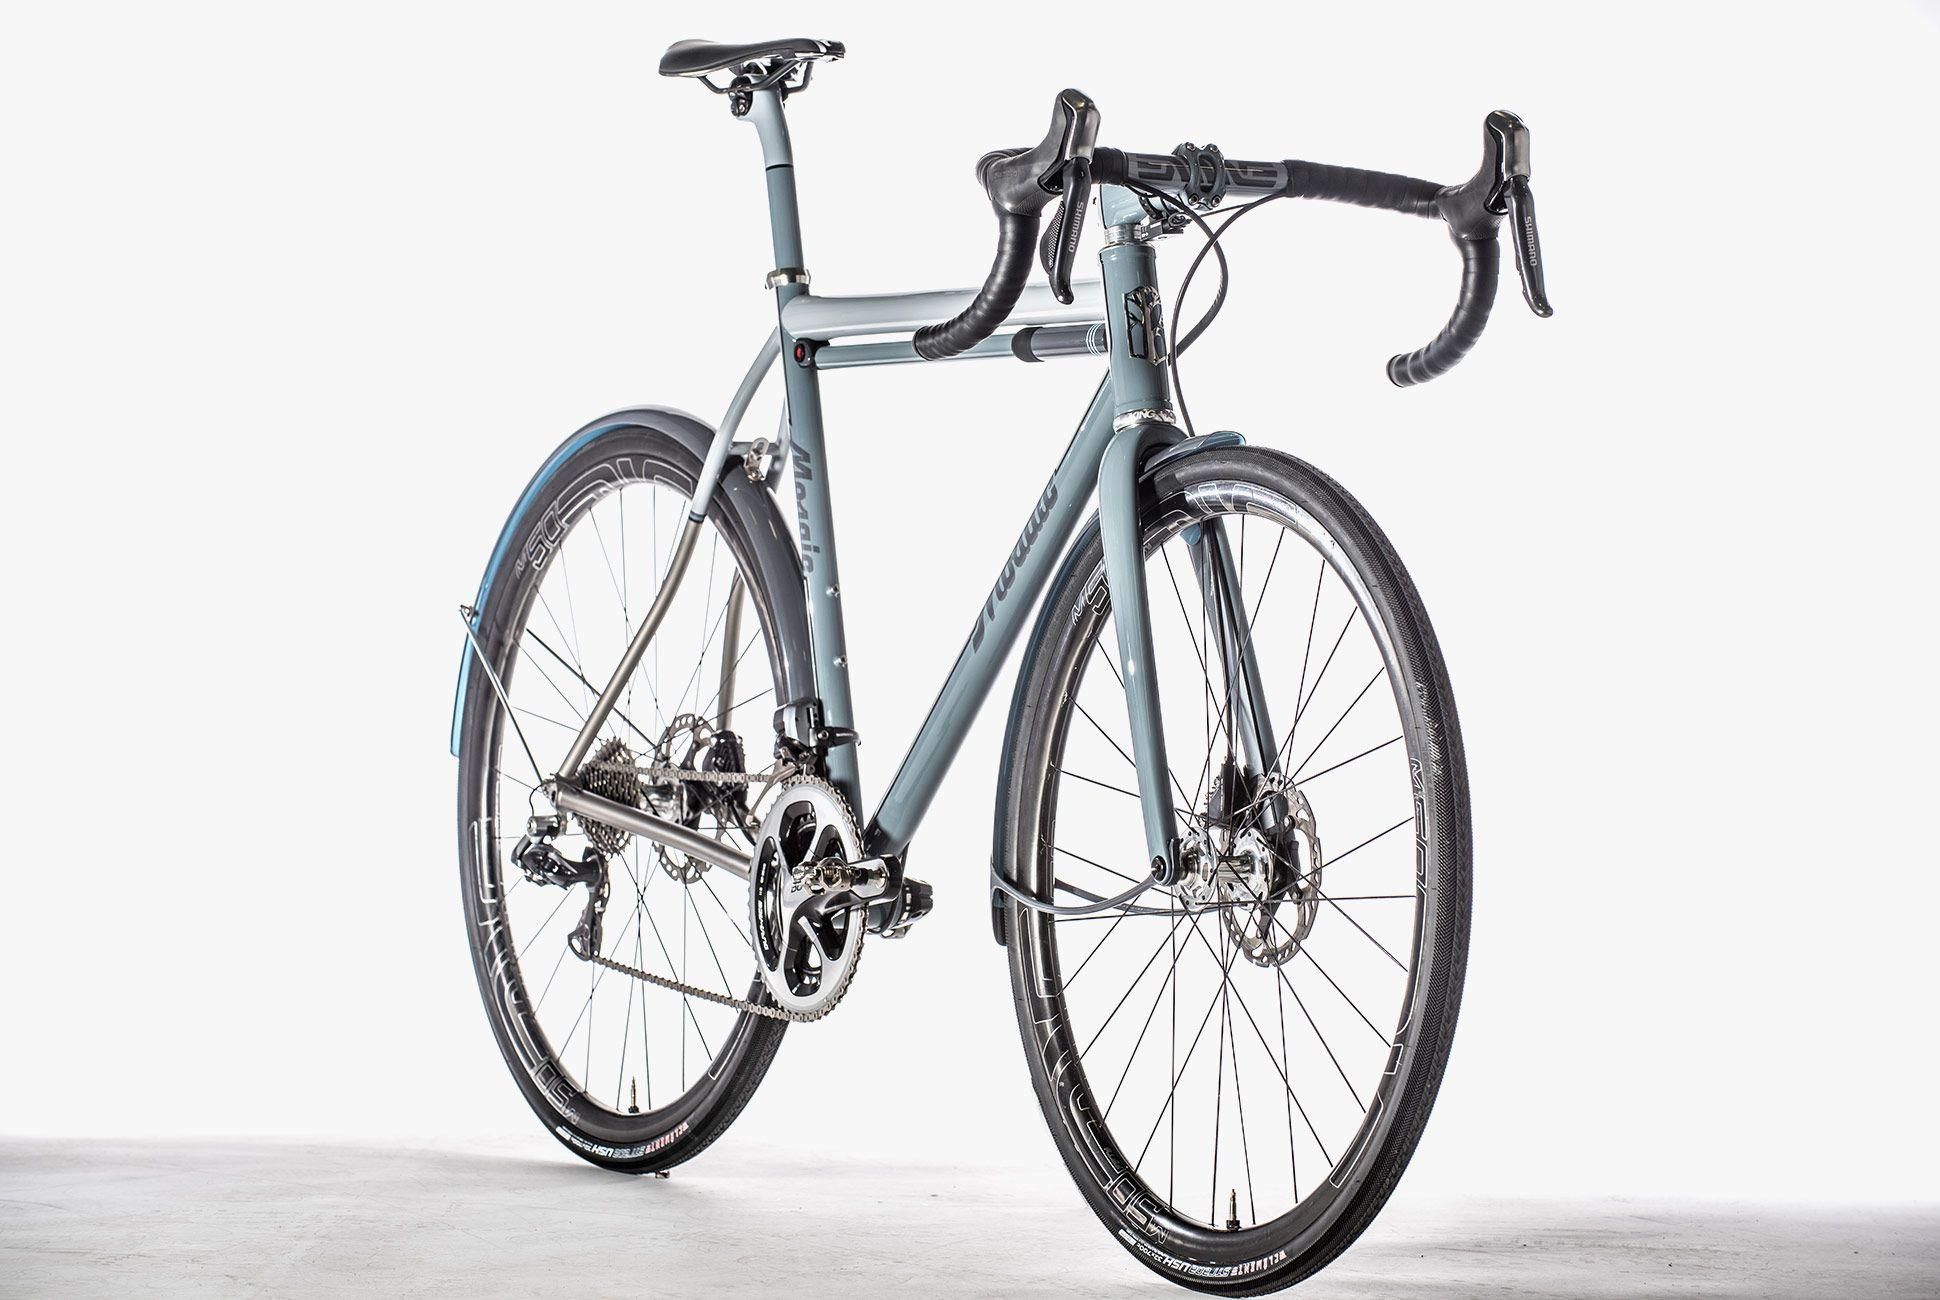 Bikes-From-NAHBS-Gear-Patrol-19